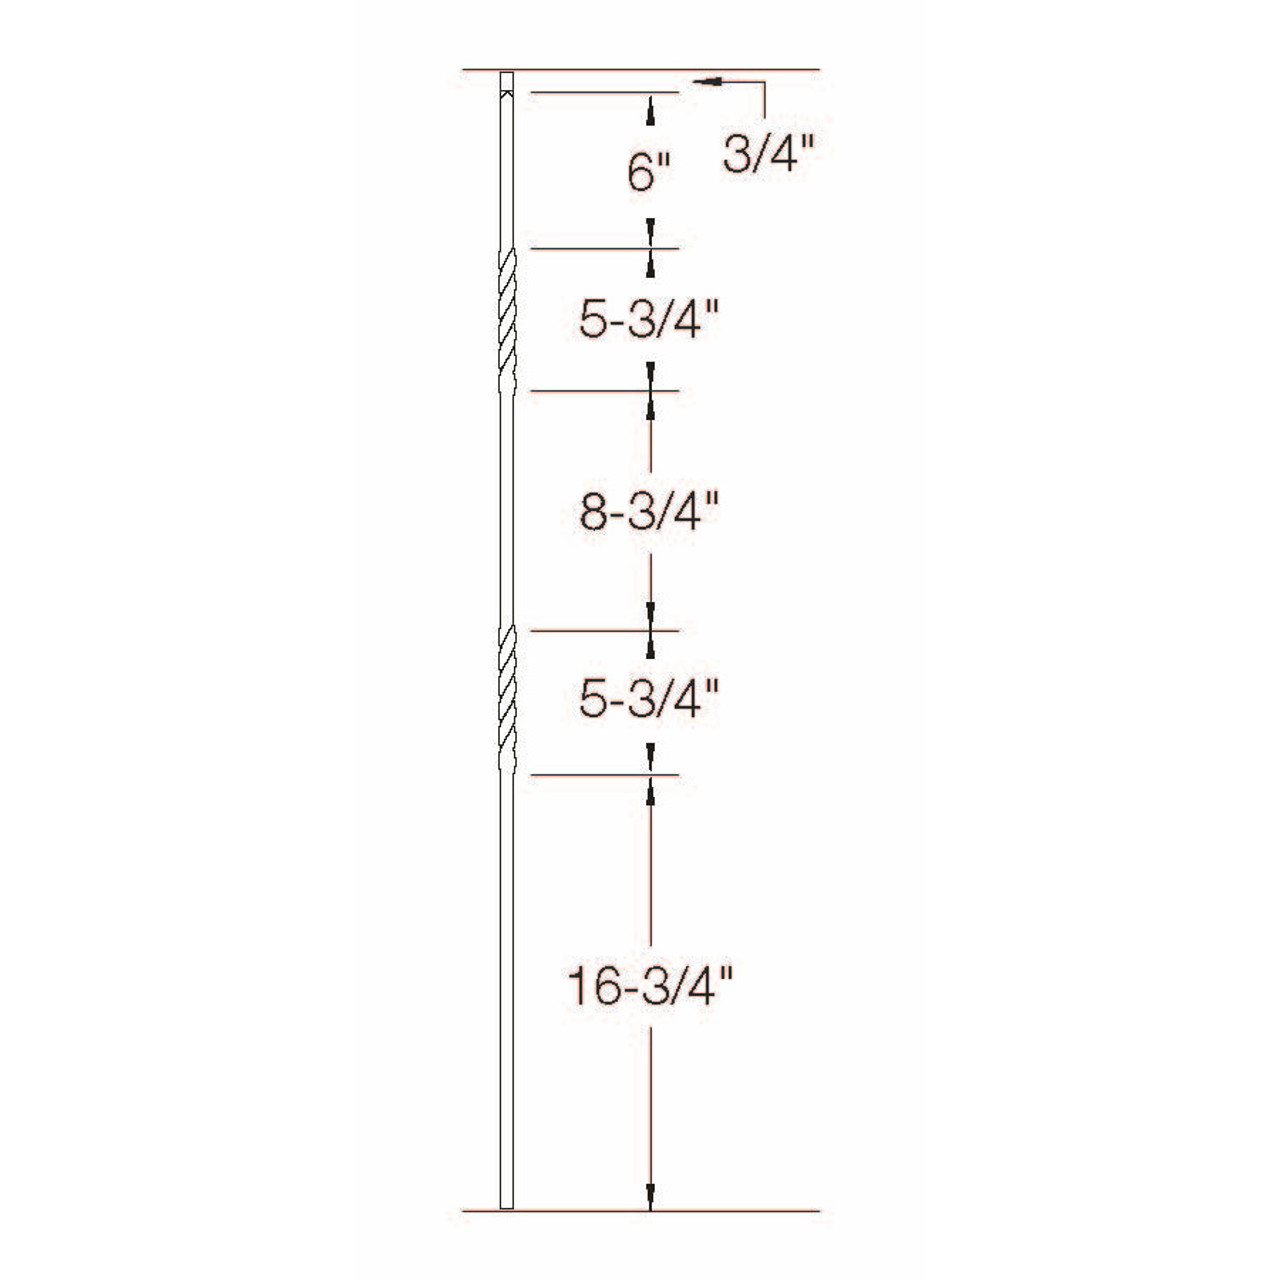 T-03 Double Twist, Tubular Steel Dimensional Information